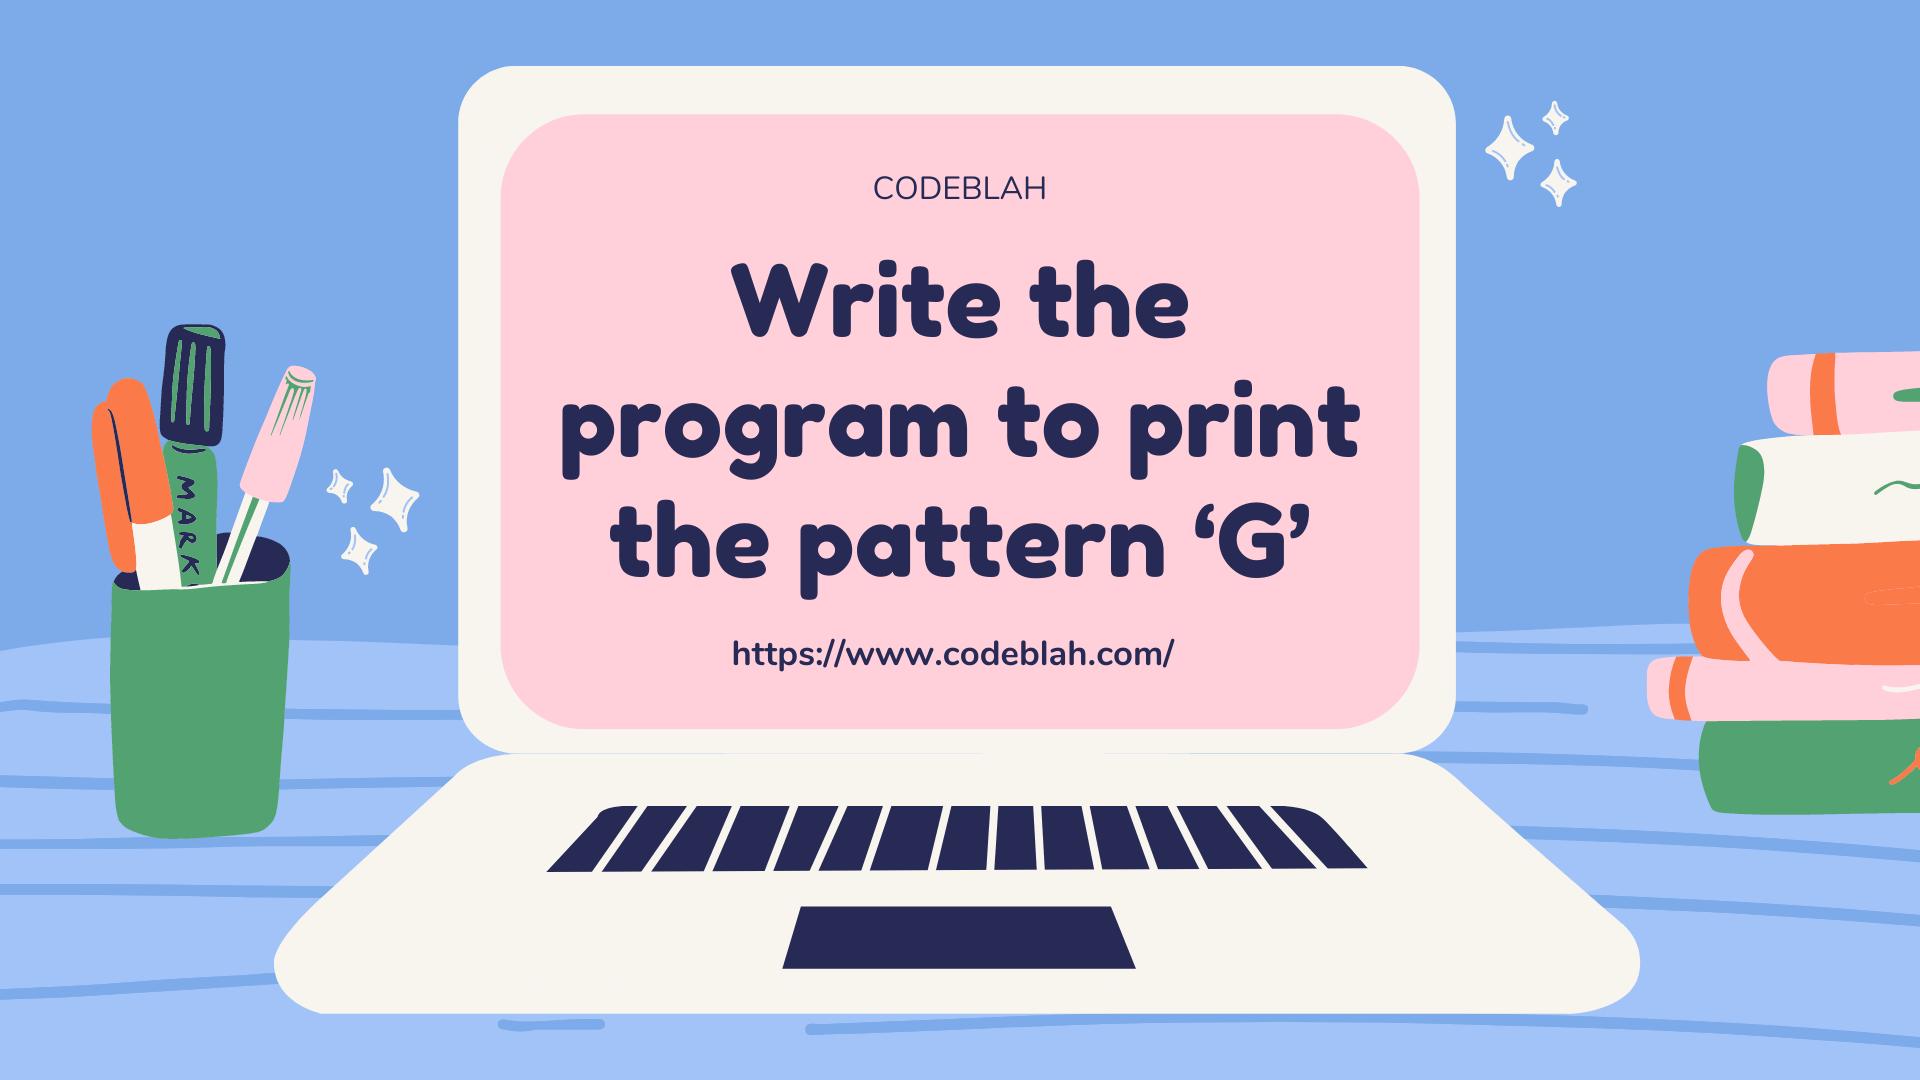 Write the program to print the pattern 'G'